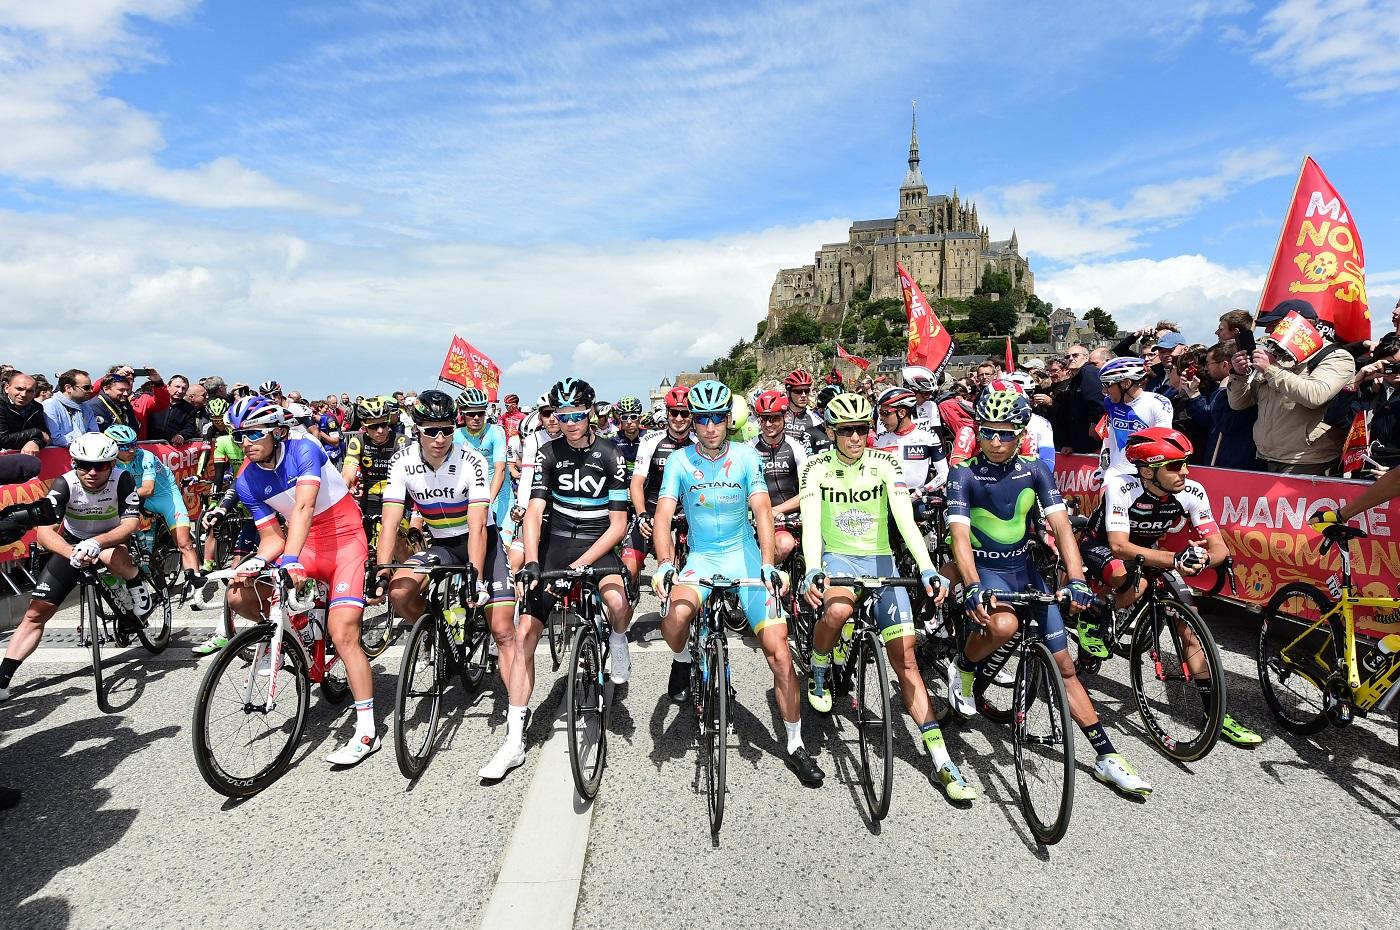 Tour de France 2016 - 02/07/2016 - Etape 1 - Mont-Saint-Michel / Utah Beach Sainte-Marie-Du-Mont (188km) - CAVENDISH Mark (TEAM DIMENSION DATA); VICHOT Arthur (FDJ); SAGAN Peter (TINKOFF); FROOME Christopher (TEAM SKY); NIBALI Vincenzo (ASTANA PRO TEAM); CONTADOR Alberto (TINKOFF); QUINTANA Nairo Alexander (MOVISTAR)